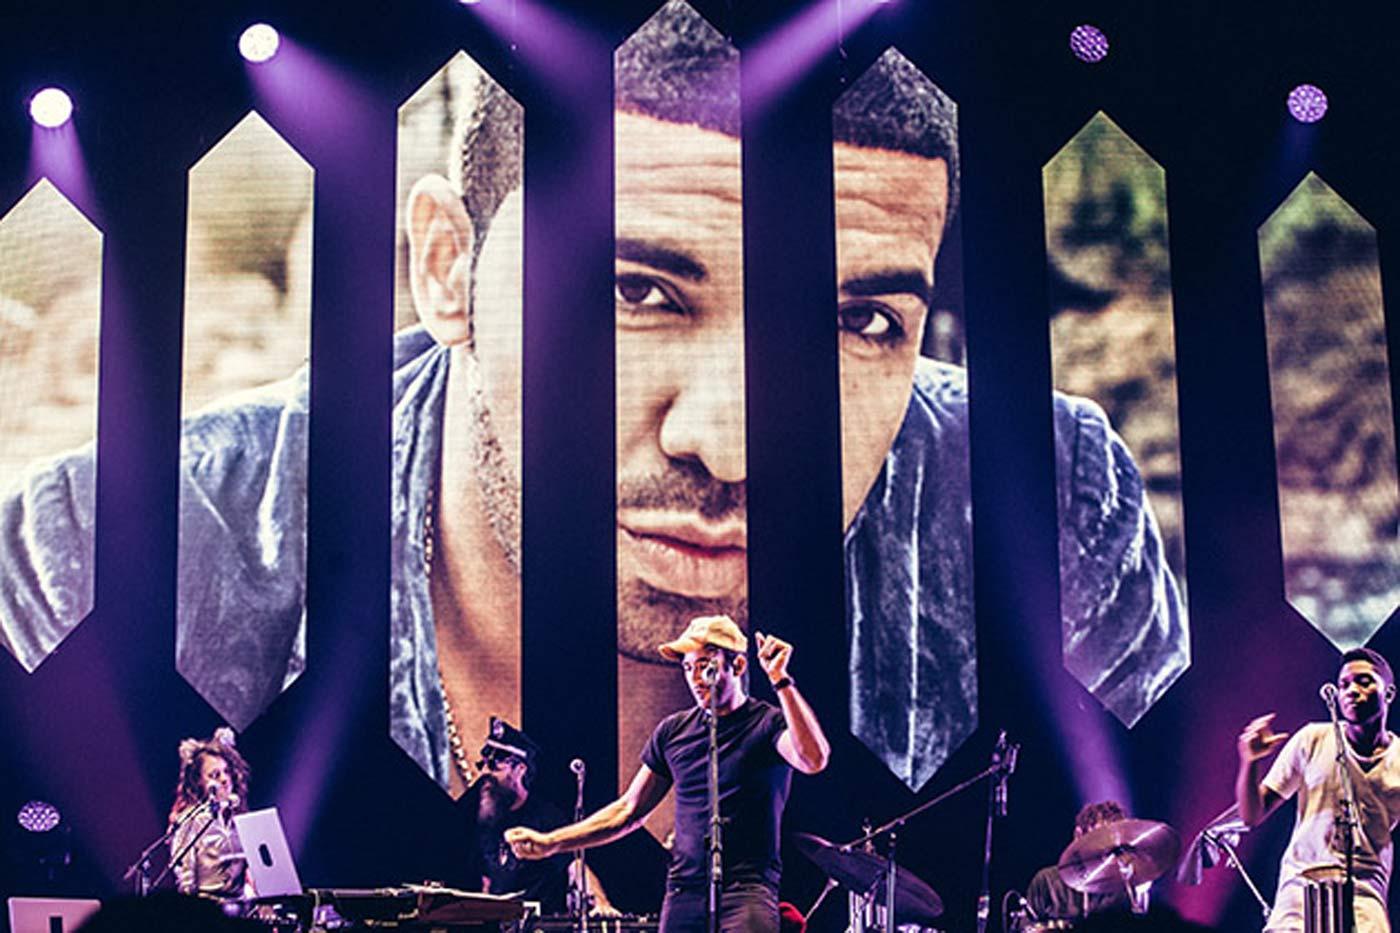 Escucha el disco de mashups de Sufjan Stevens y Drake